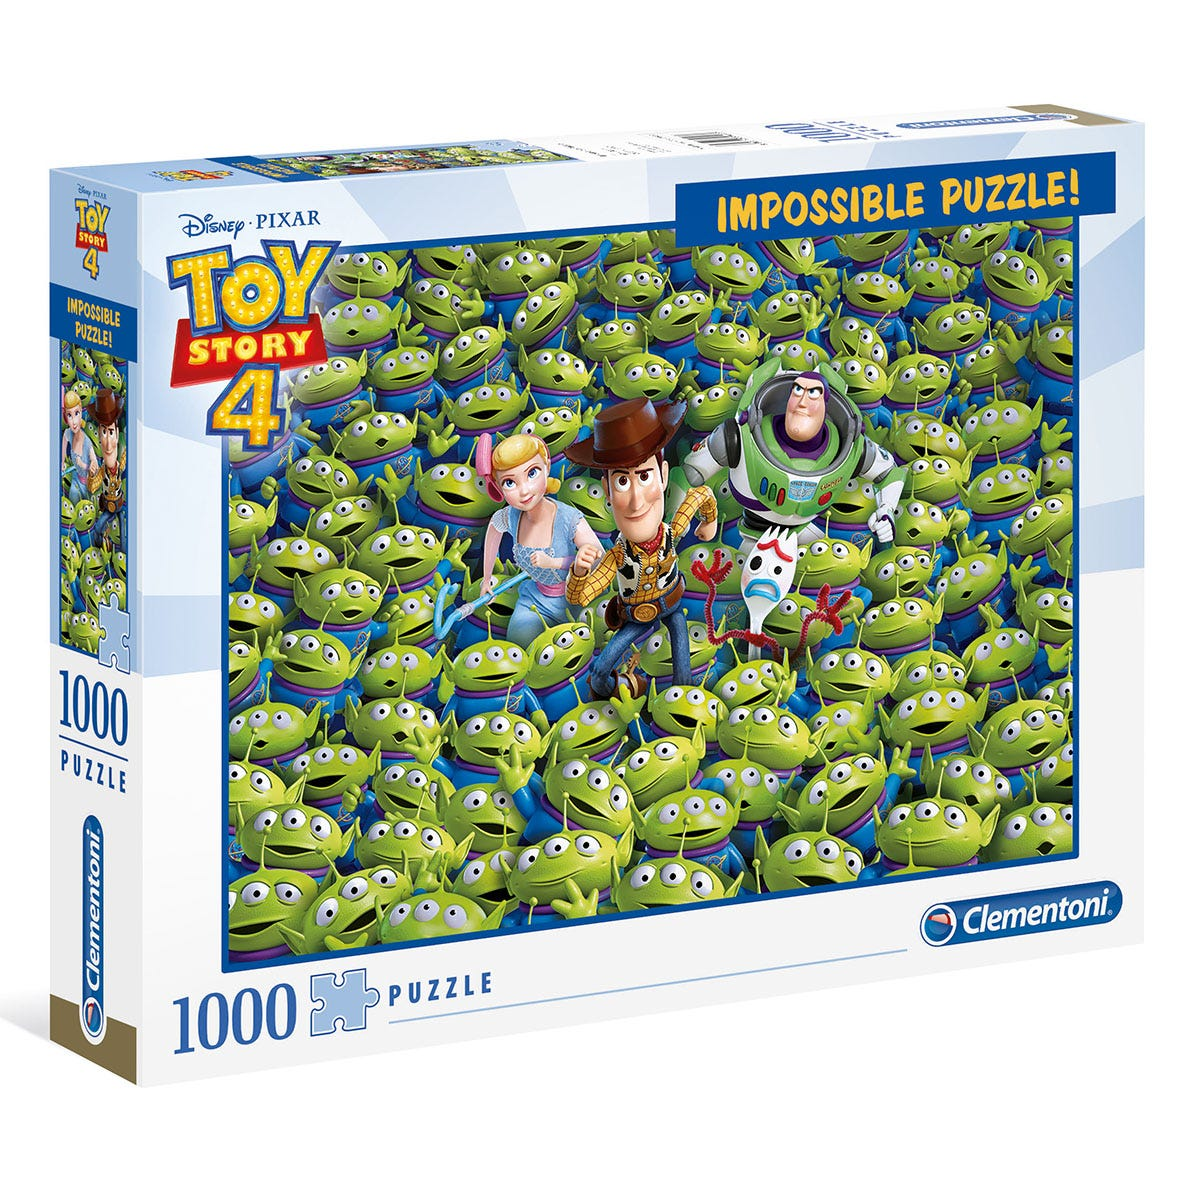 Disney Toy Story 4 Alien Impossible 1000 Piece Puzzle